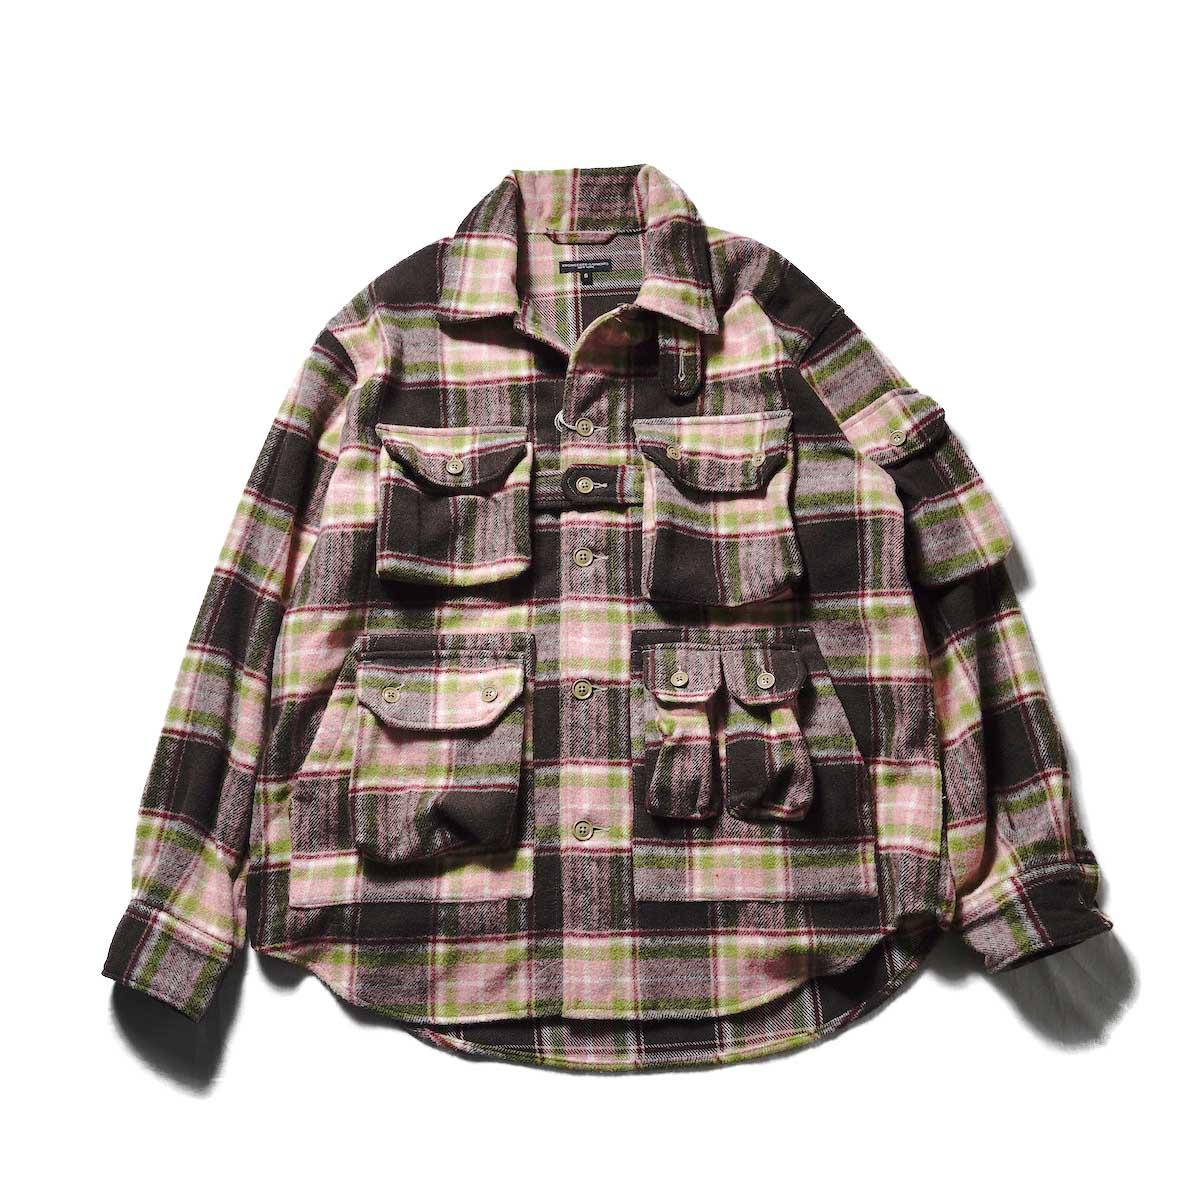 Engineered Garments / EXPLORER SHIRT JACKET - POLY WOOL PLAID (Brown / Pink)